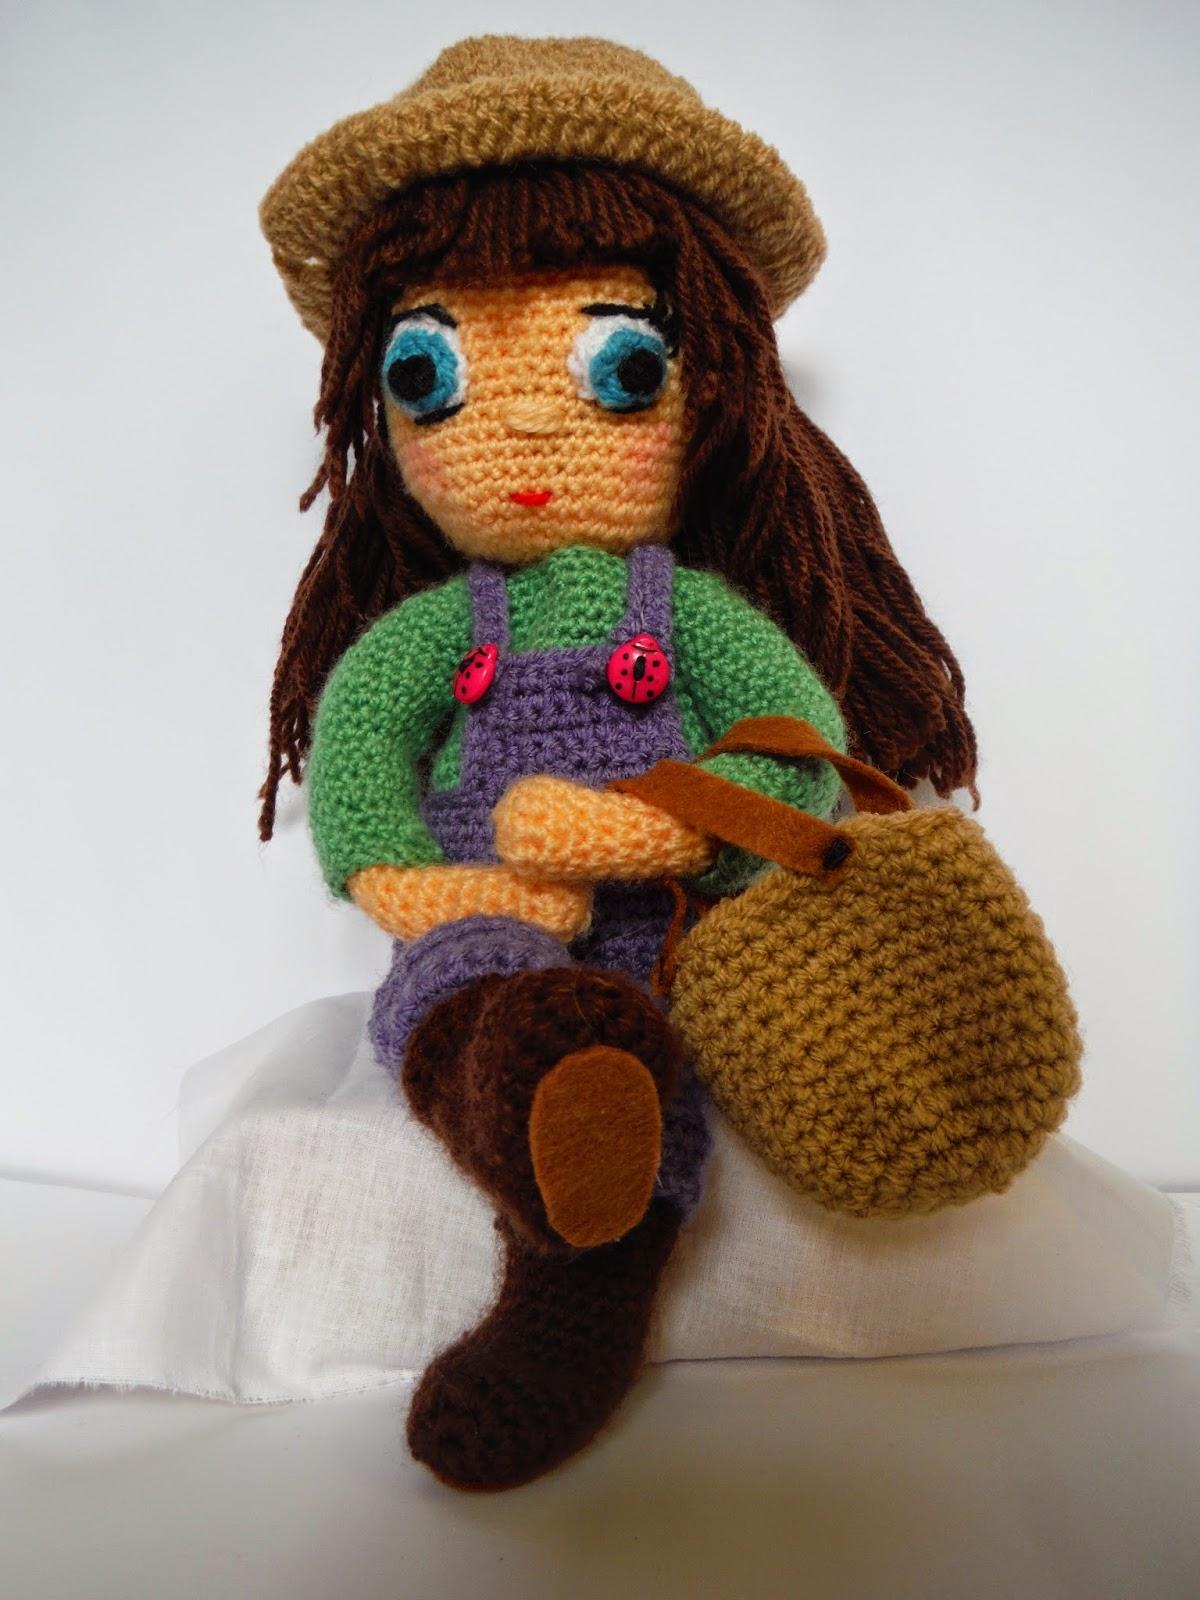 muñeca personalizada amigurumi